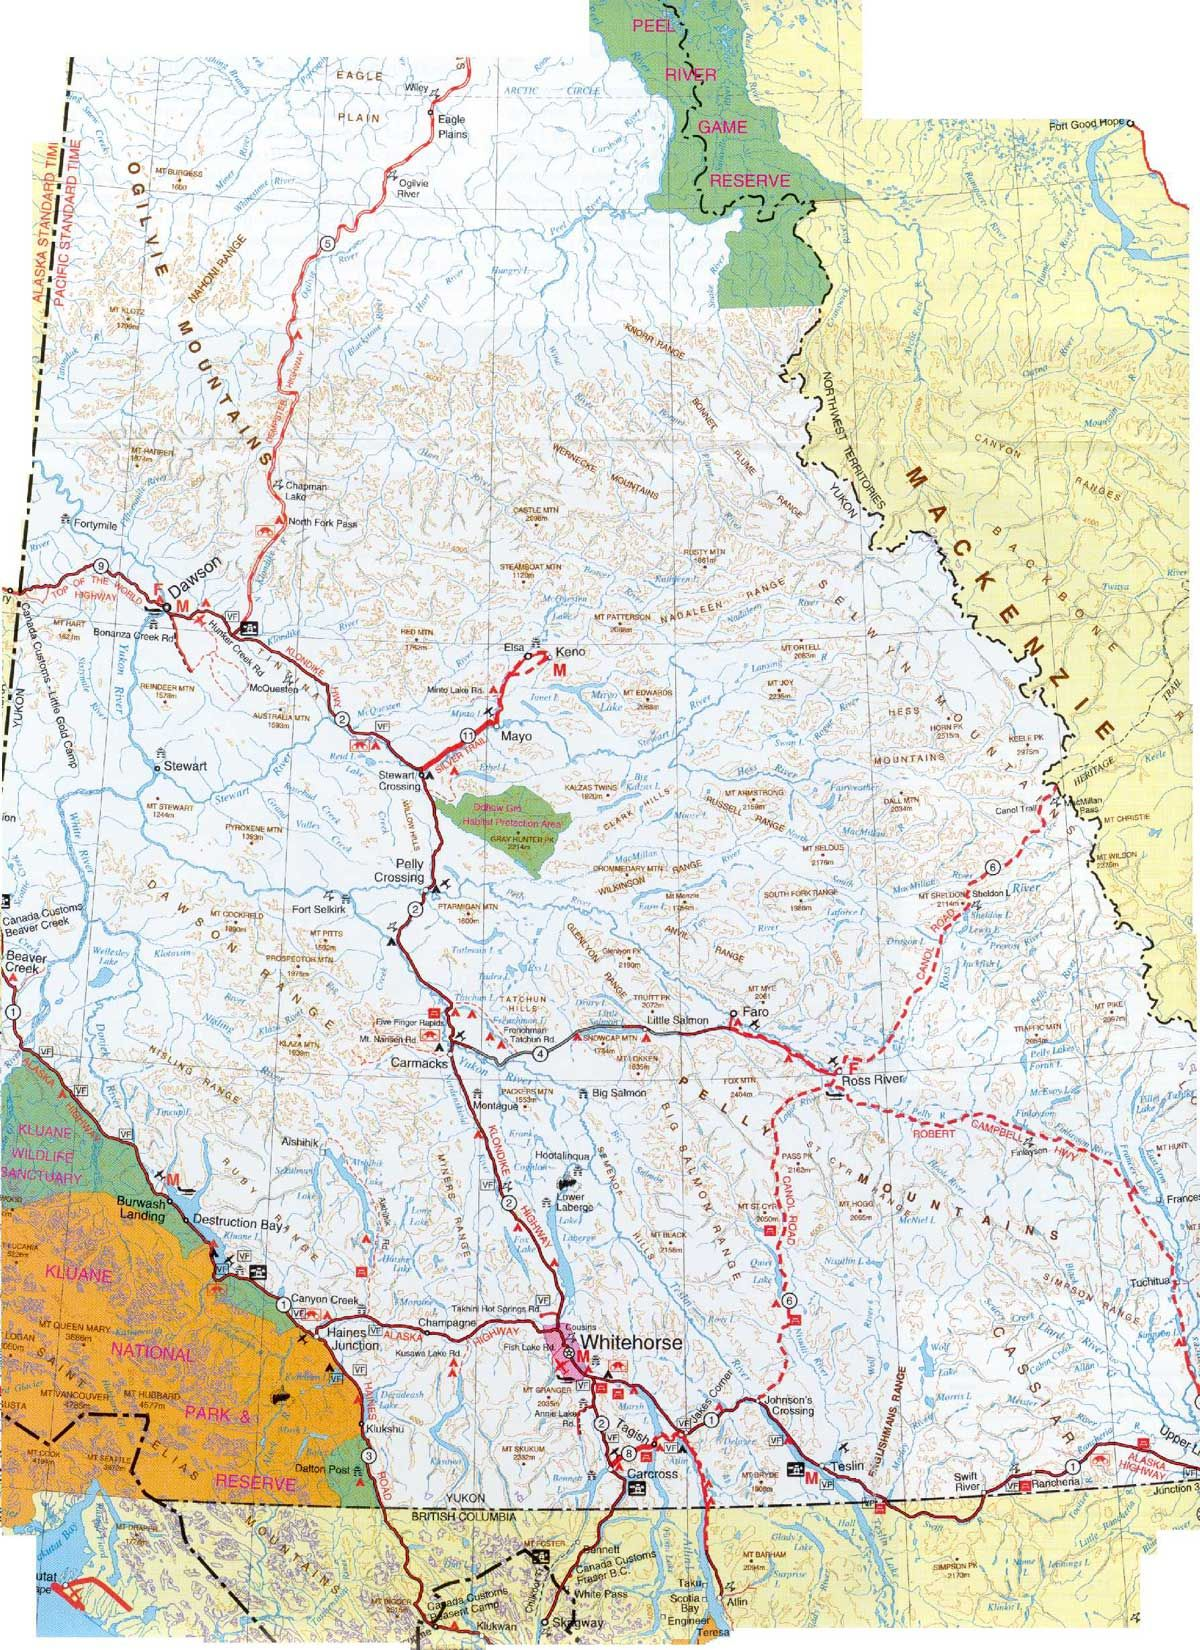 Check canada yukon map my travels my travels pinterest check canada yukon map gumiabroncs Gallery